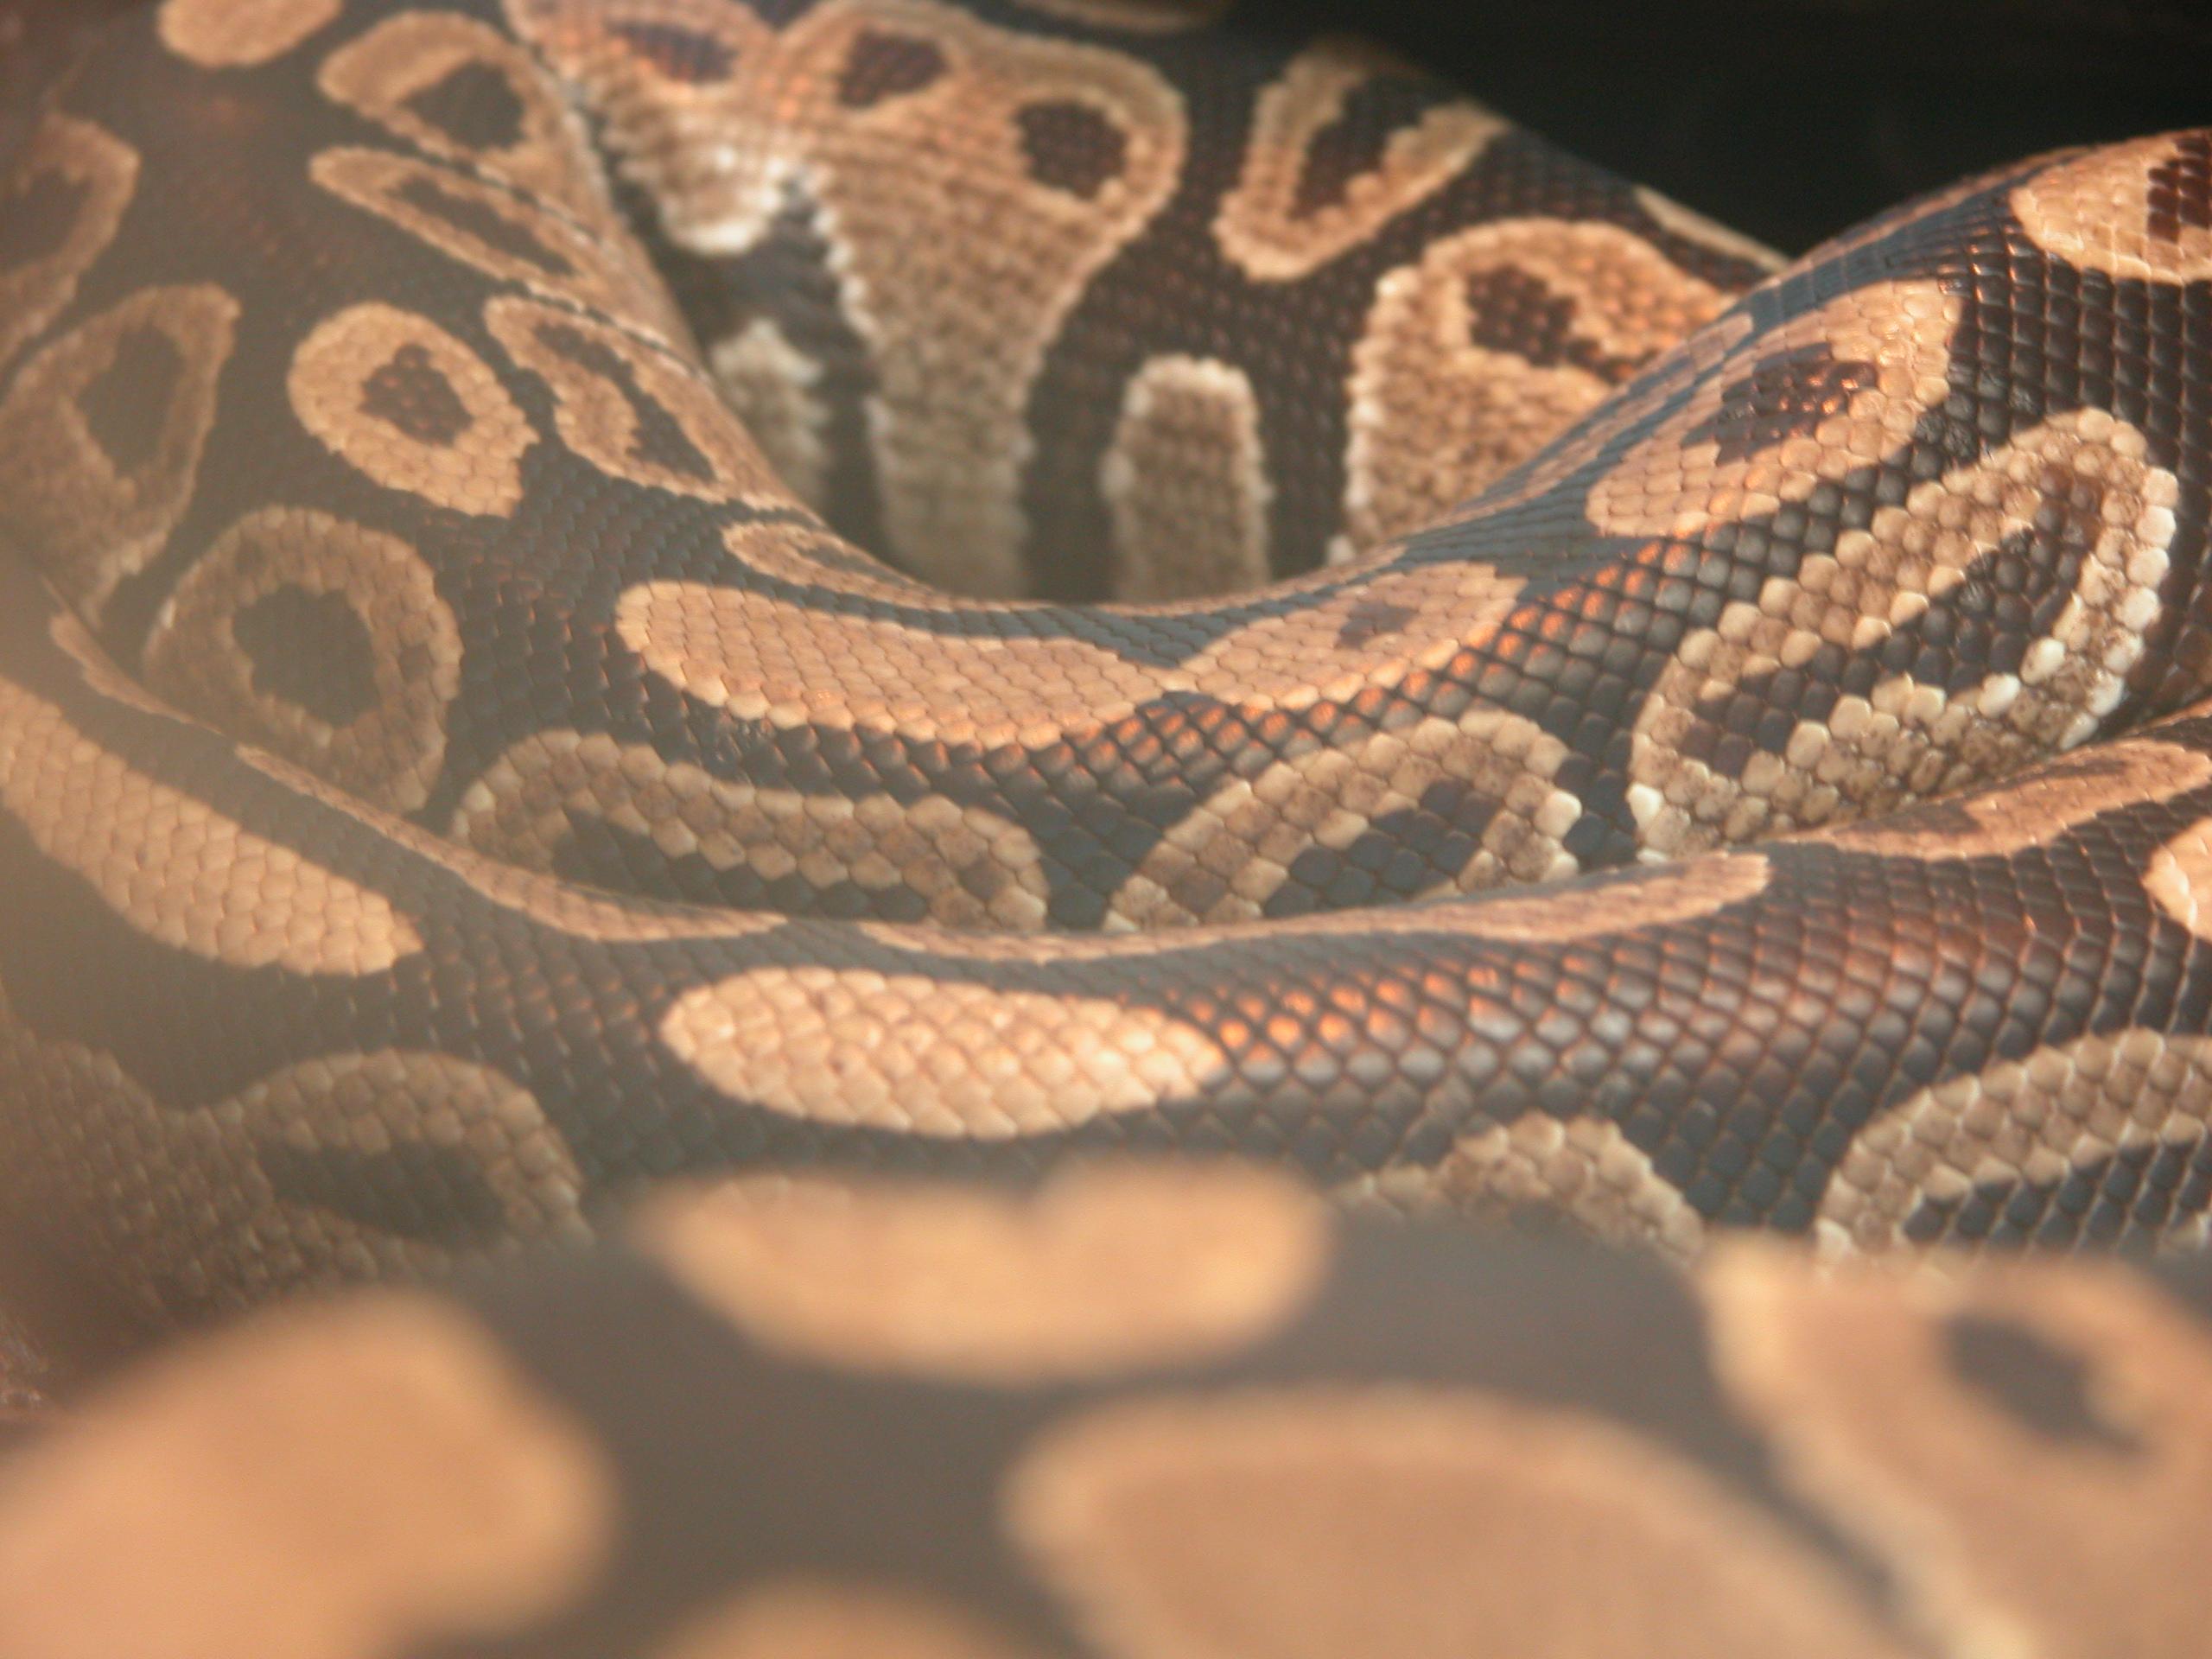 snake long skin snakeskin reptile scale scales pattern